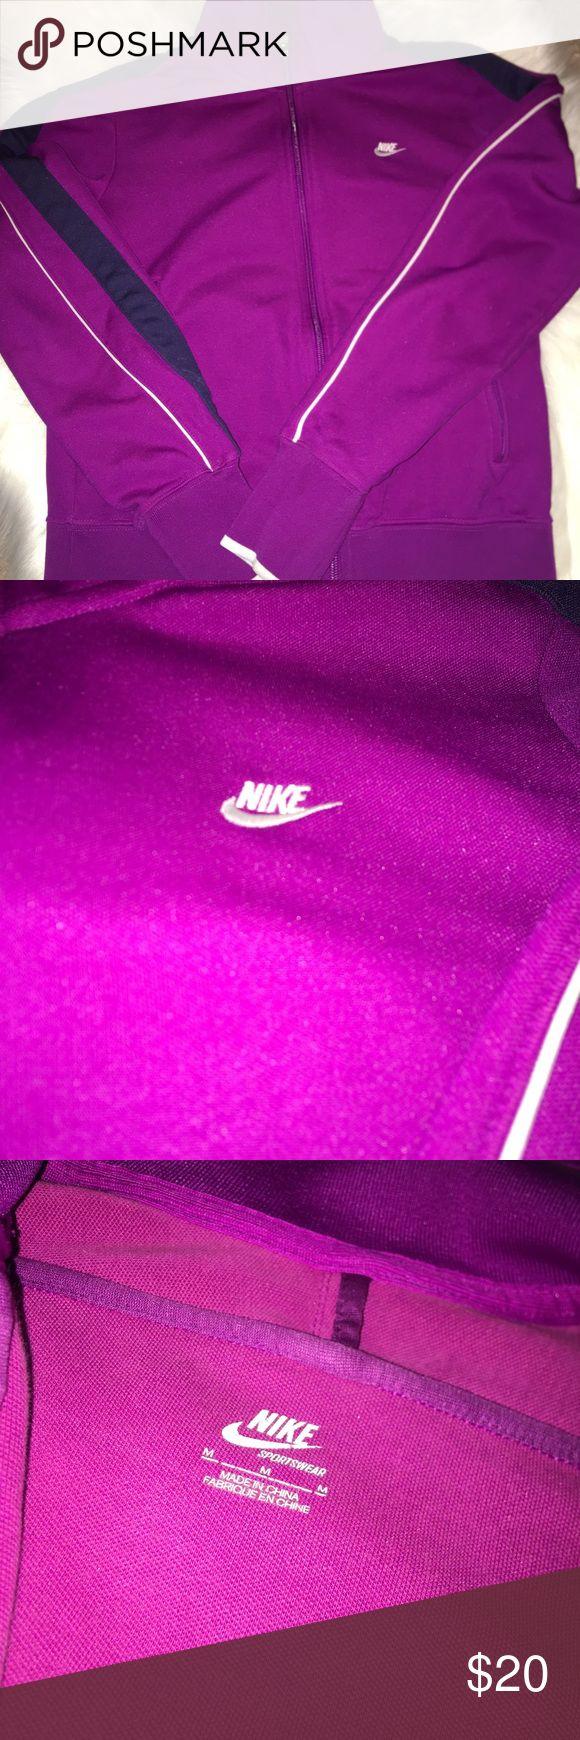 Nike jacket zip up size M Nike women's purple zip up jacket size medium with 2 side zip up pockets Nike Tops Sweatshirts & Hoodies